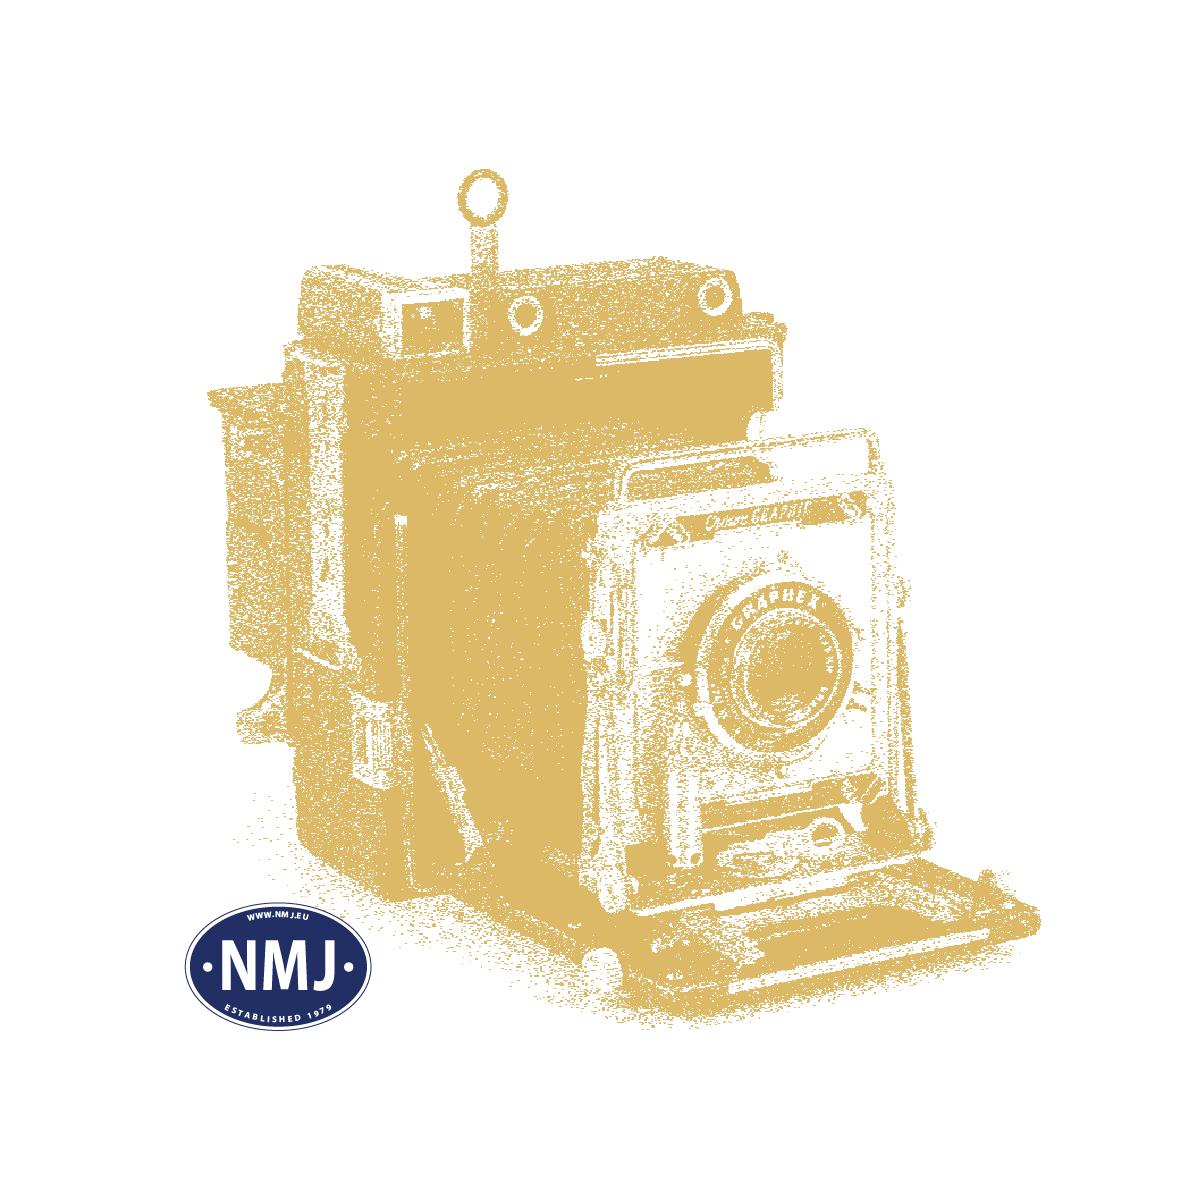 NMJT132.101 - NMJ Topline NSB B4 25956, Gammeldesign, (rotbraun)